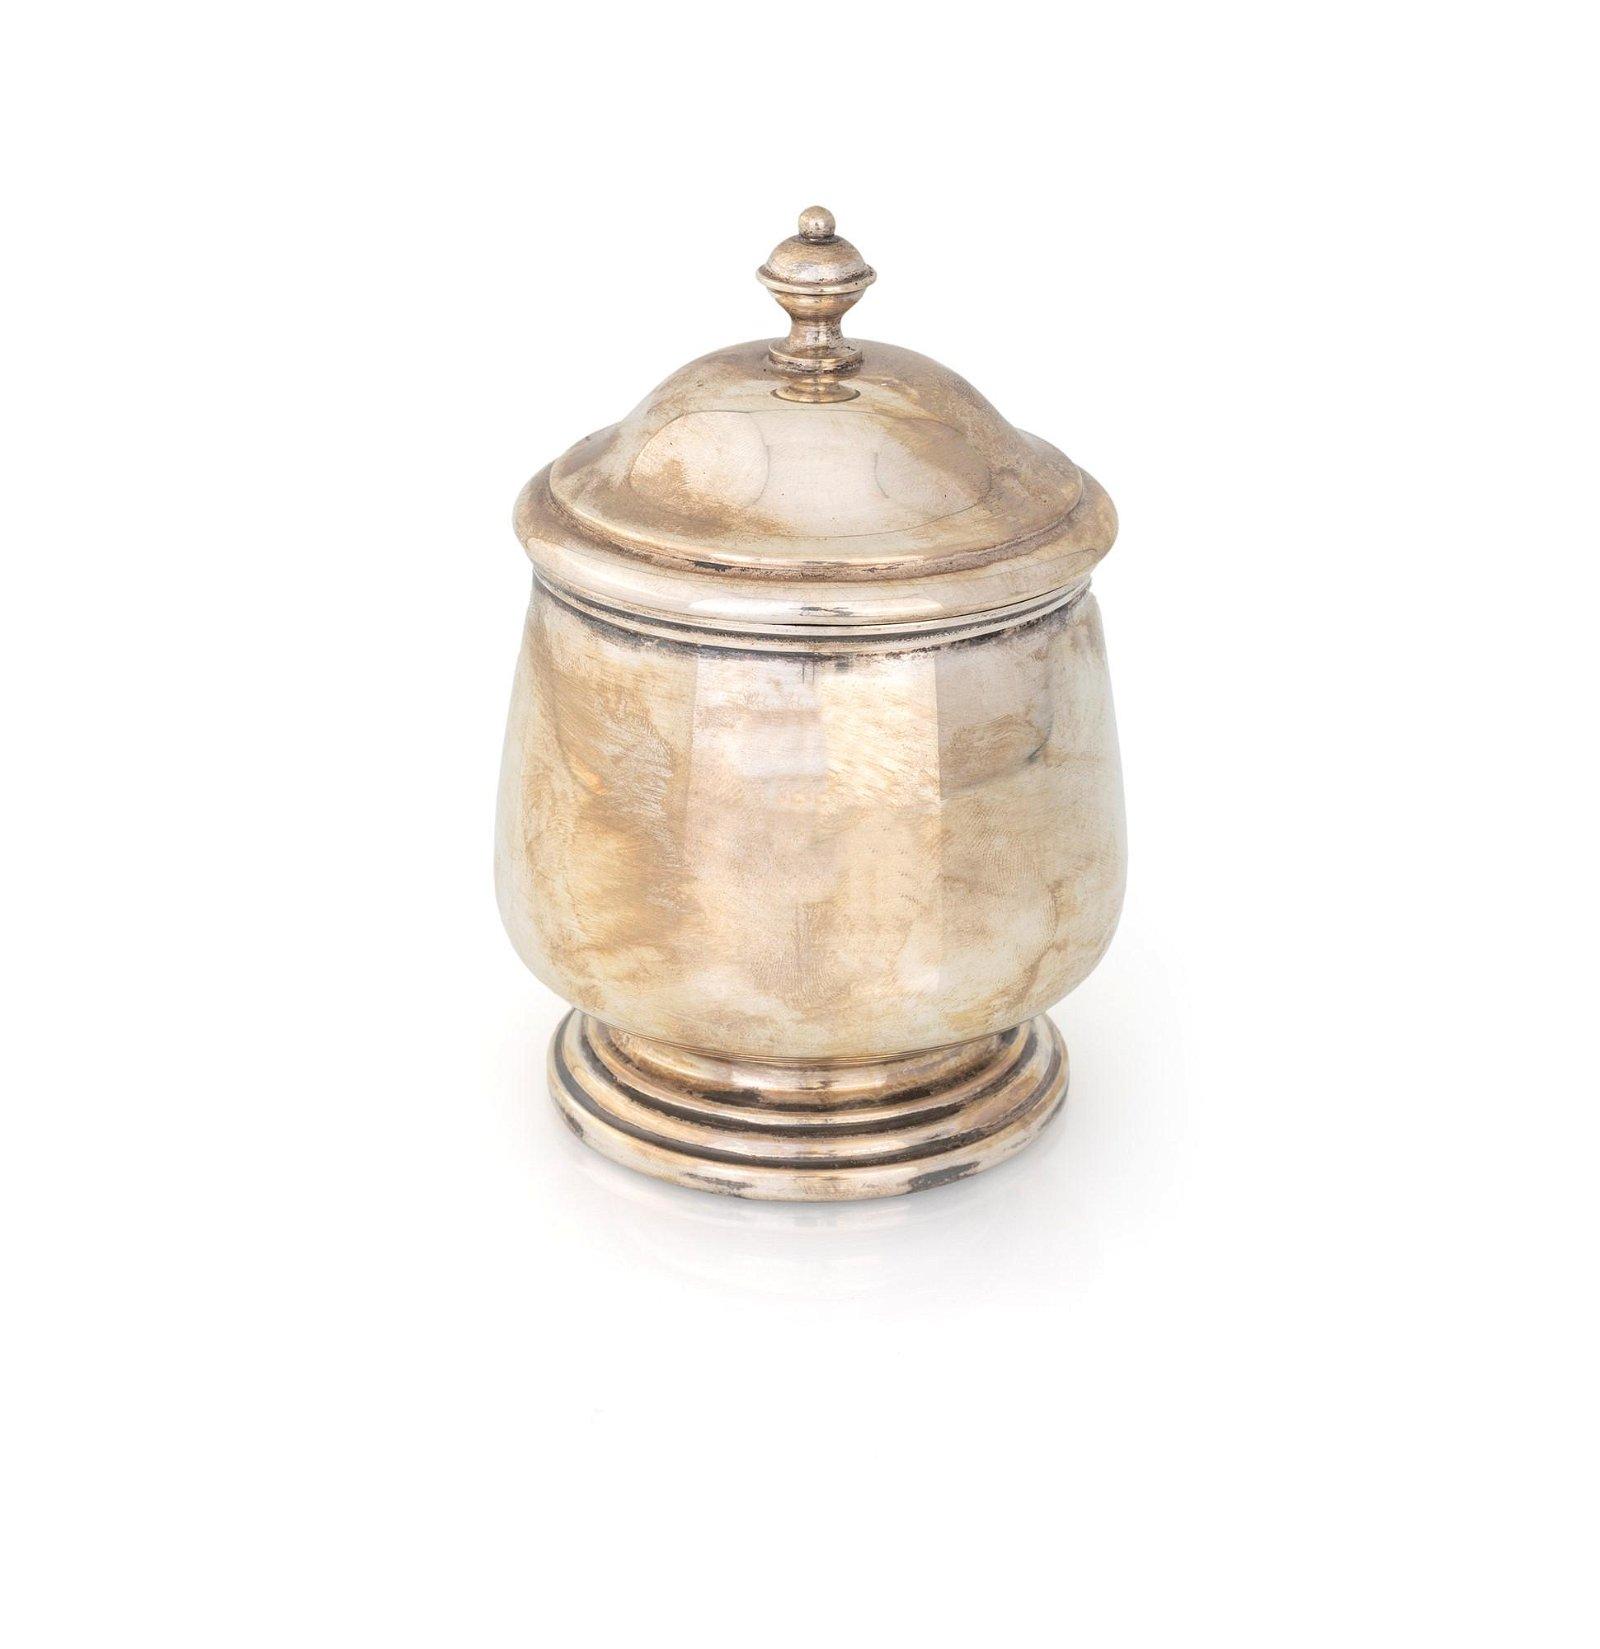 Silver circular sugar bowl with lit